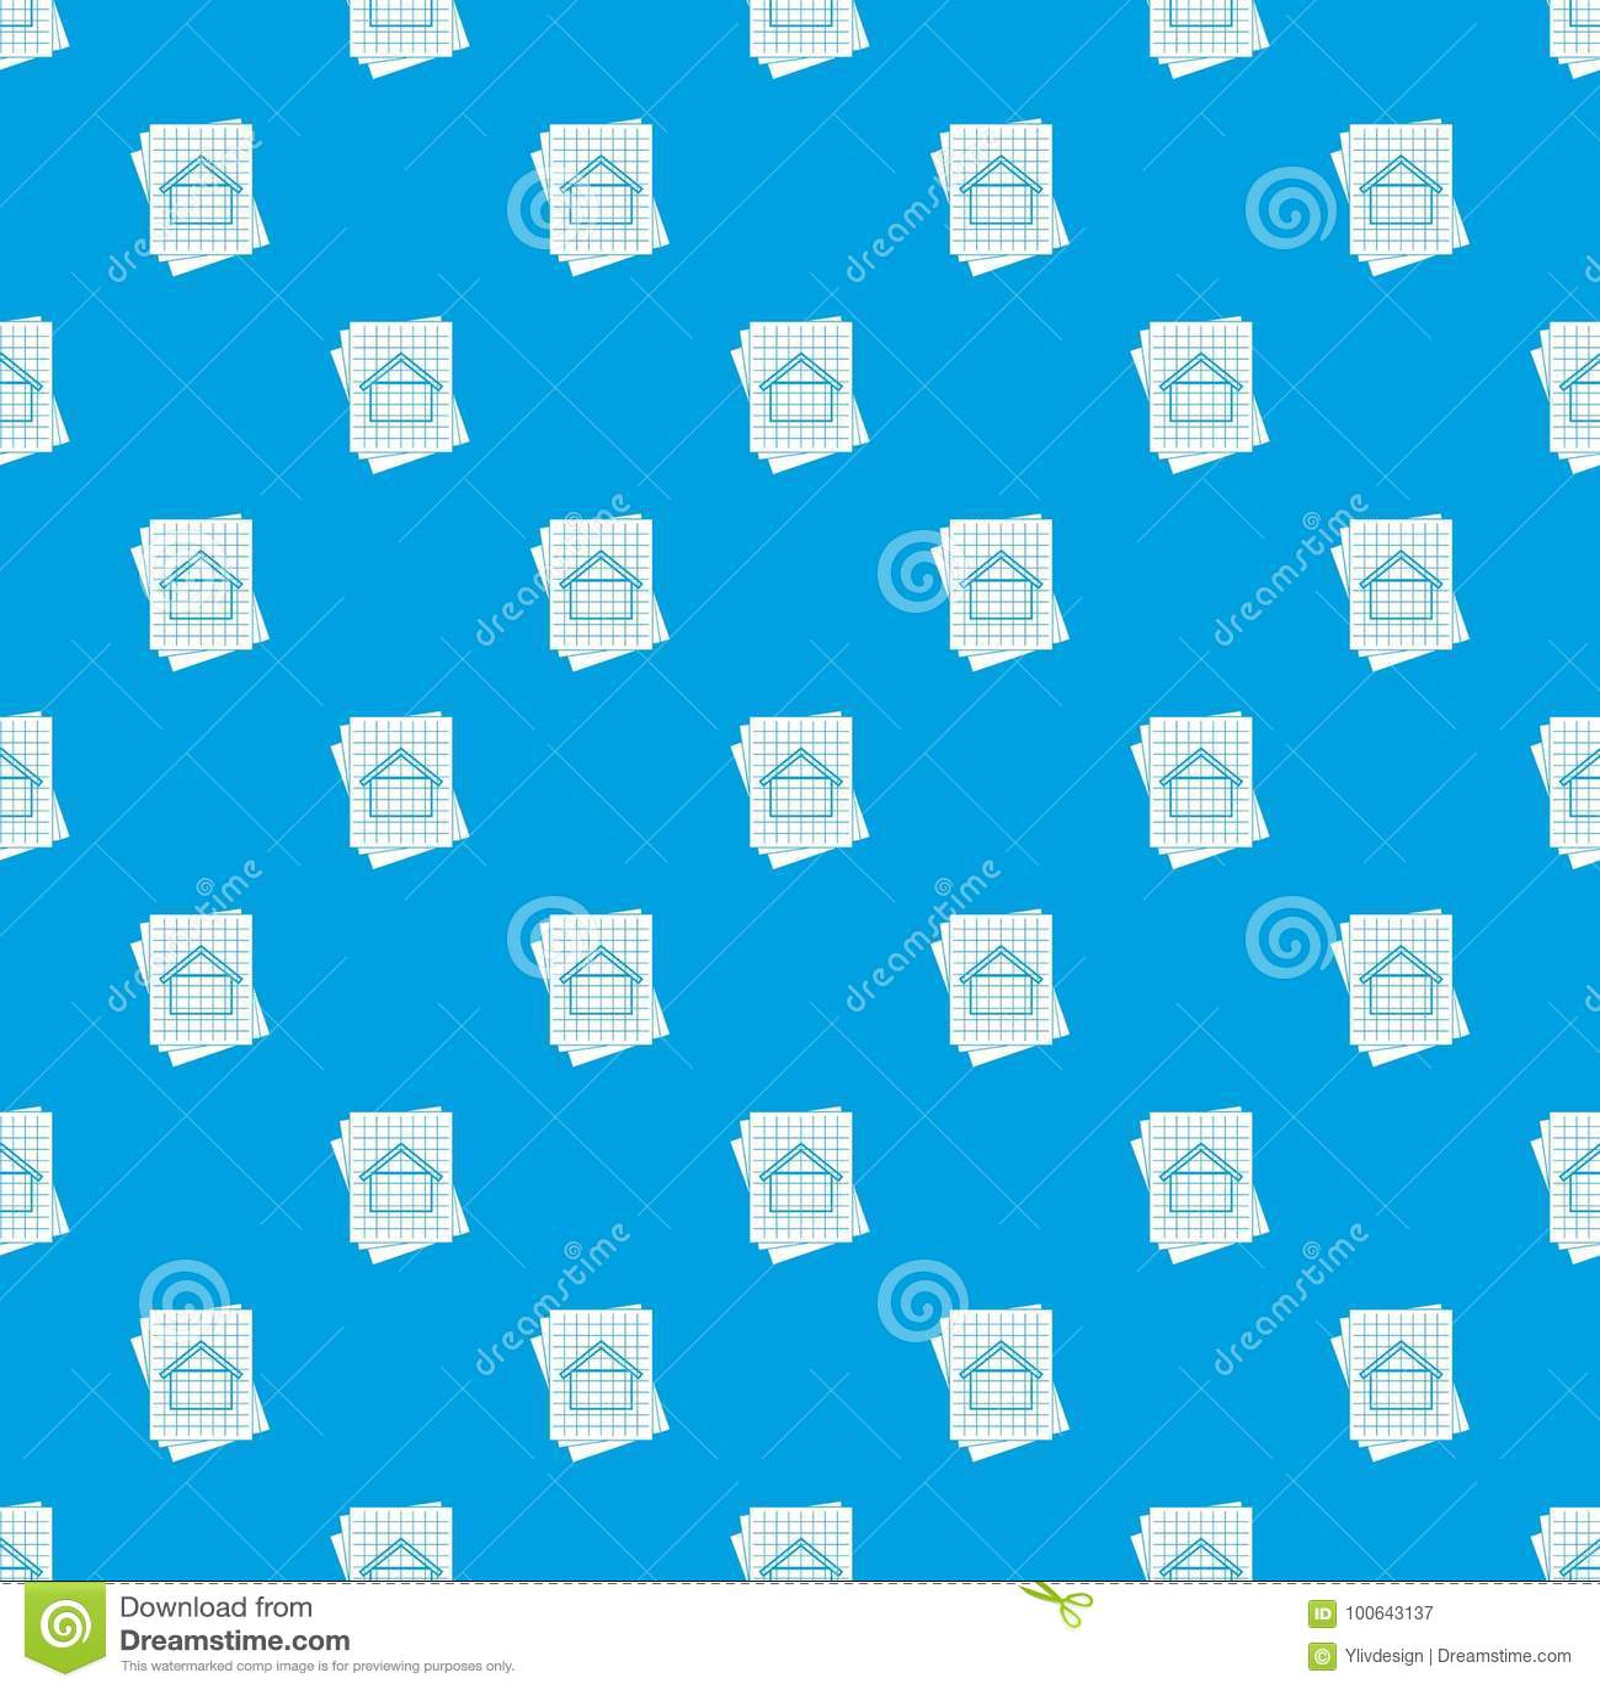 House blueprint pattern seamless blue stock vector illustration of download house blueprint pattern seamless blue stock vector illustration of design blueprint 100643137 malvernweather Images